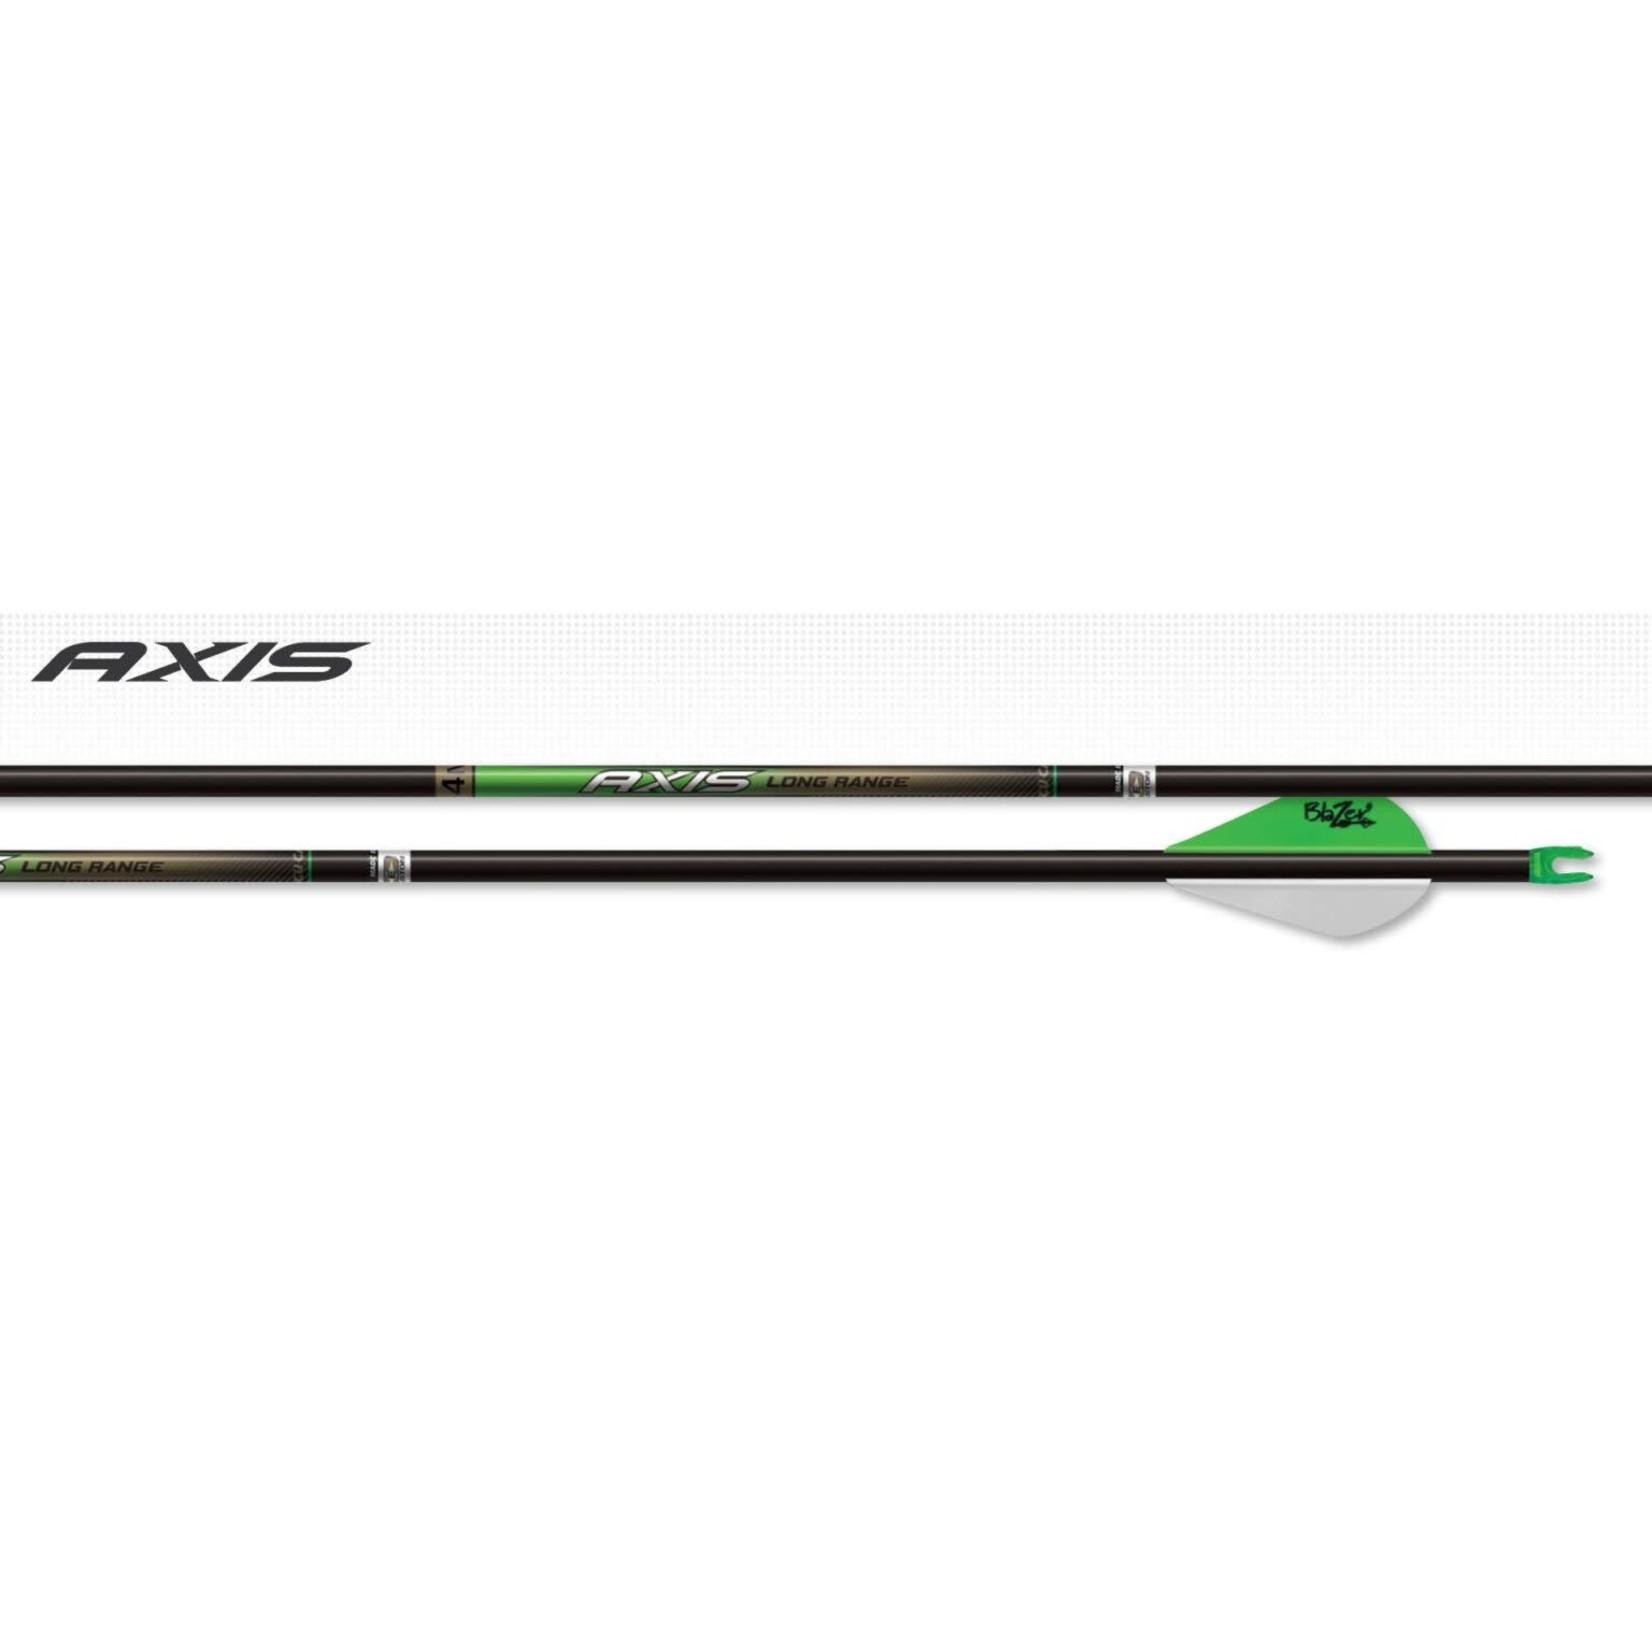 Easton Easton Axis Long Range 4mm Arrow Shafts 340 (1/2 doz)